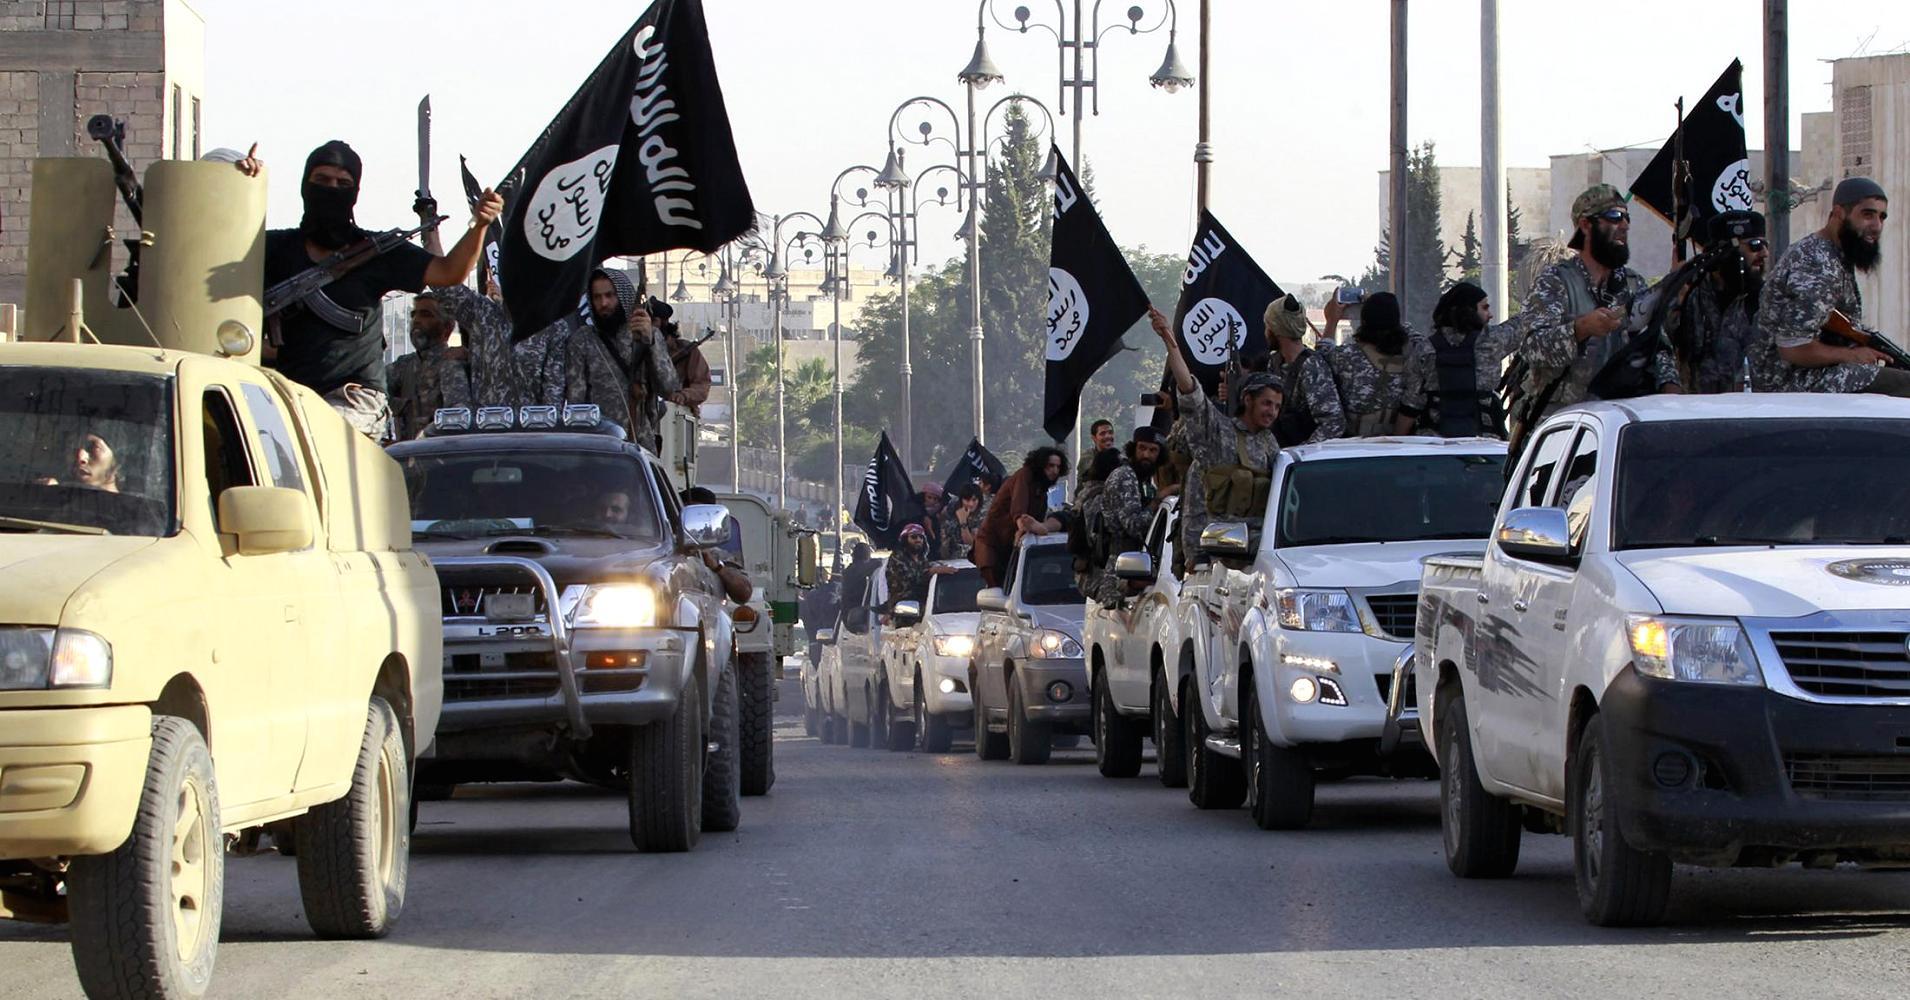 Giardiniere in Irpinia, diventa jihadista dell'Isis